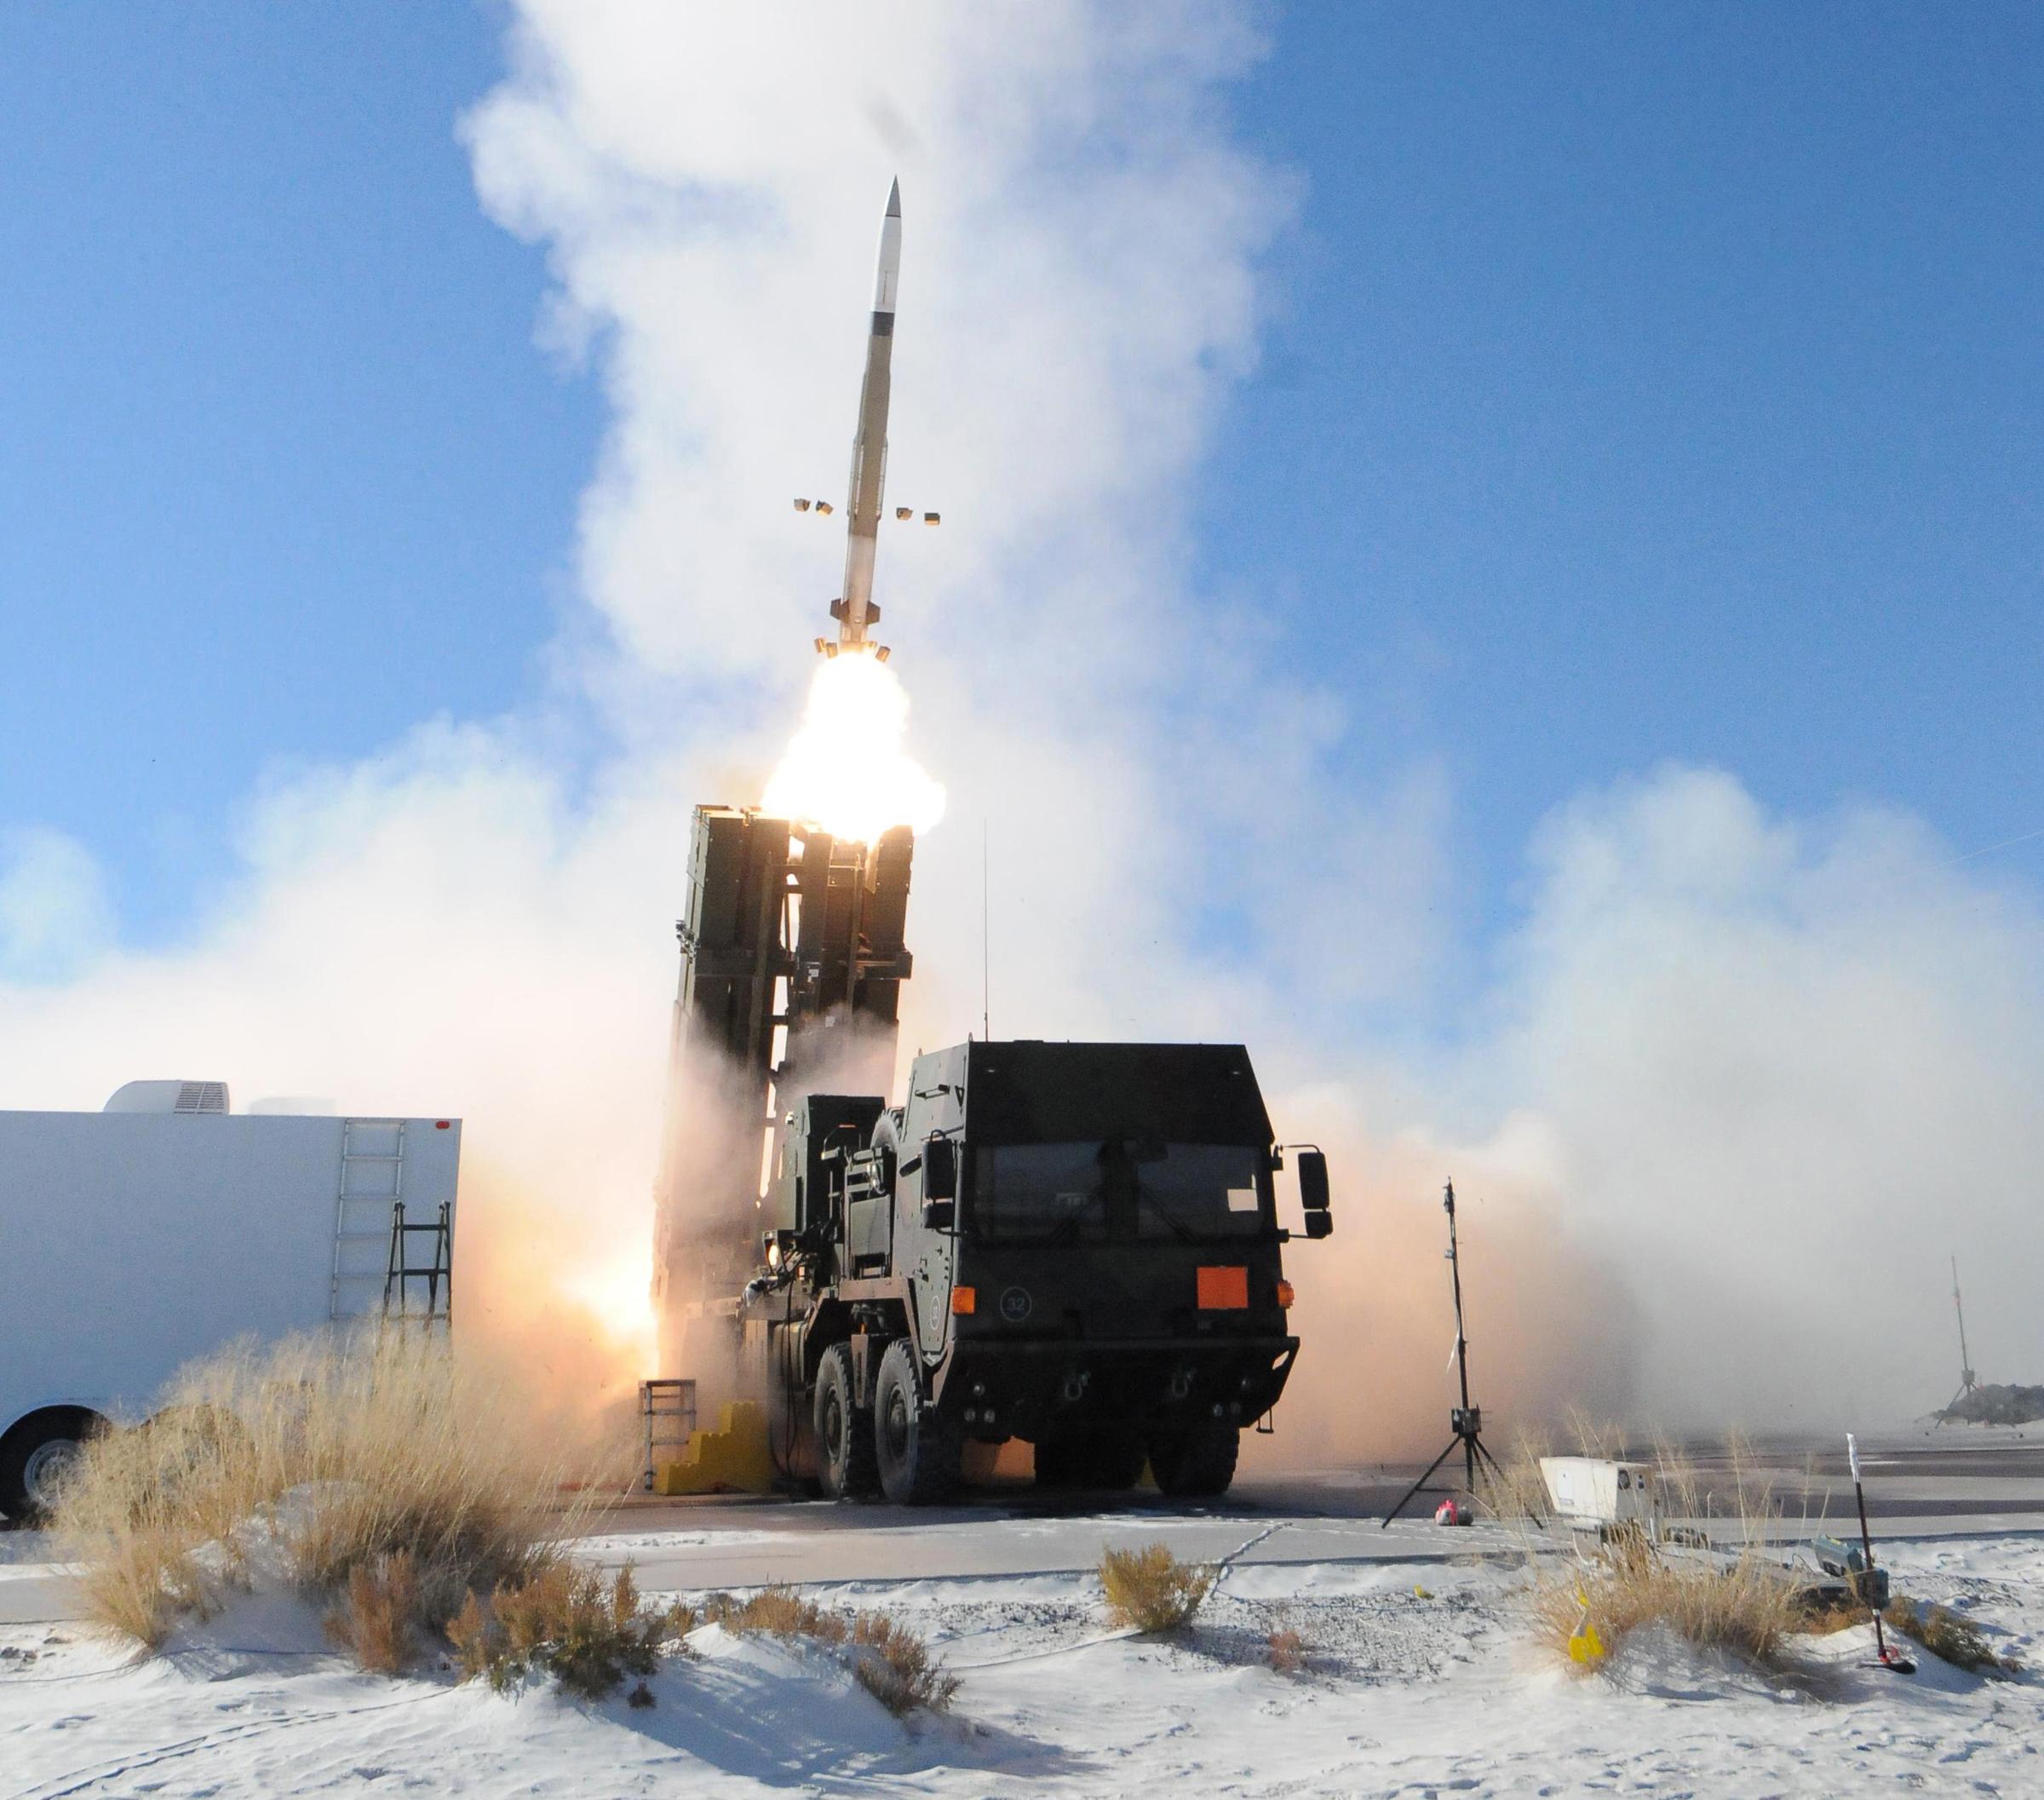 MEADS_Launch_WSMR_2734-1.jpg